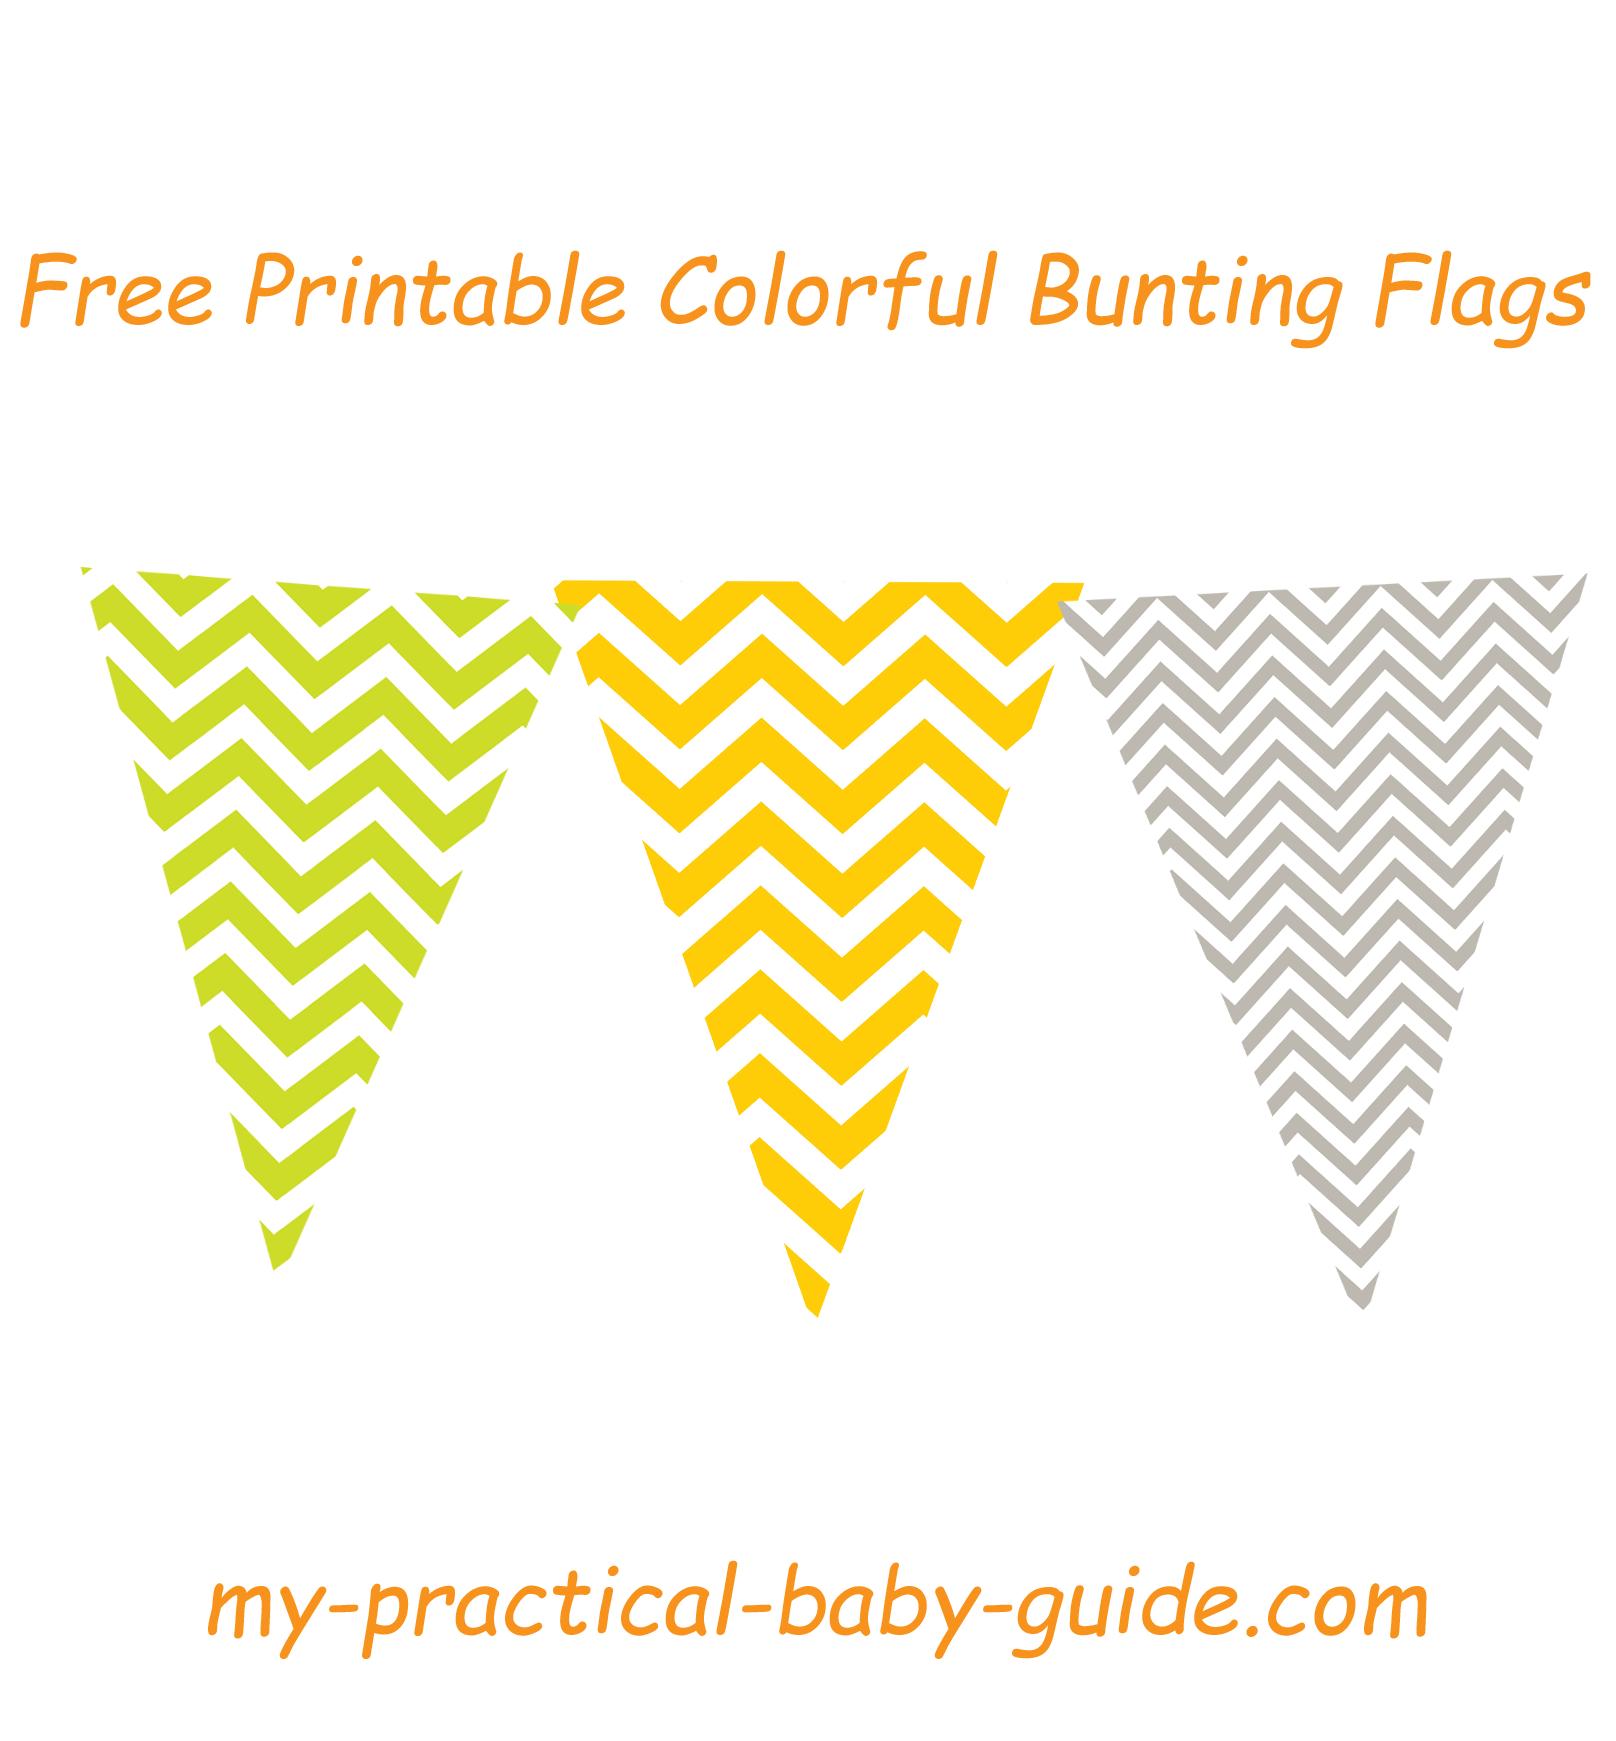 Woodland Baby Shower Theme Ideas - My Practical Baby Shower Guide - Free Baby Shower Printables Decorations